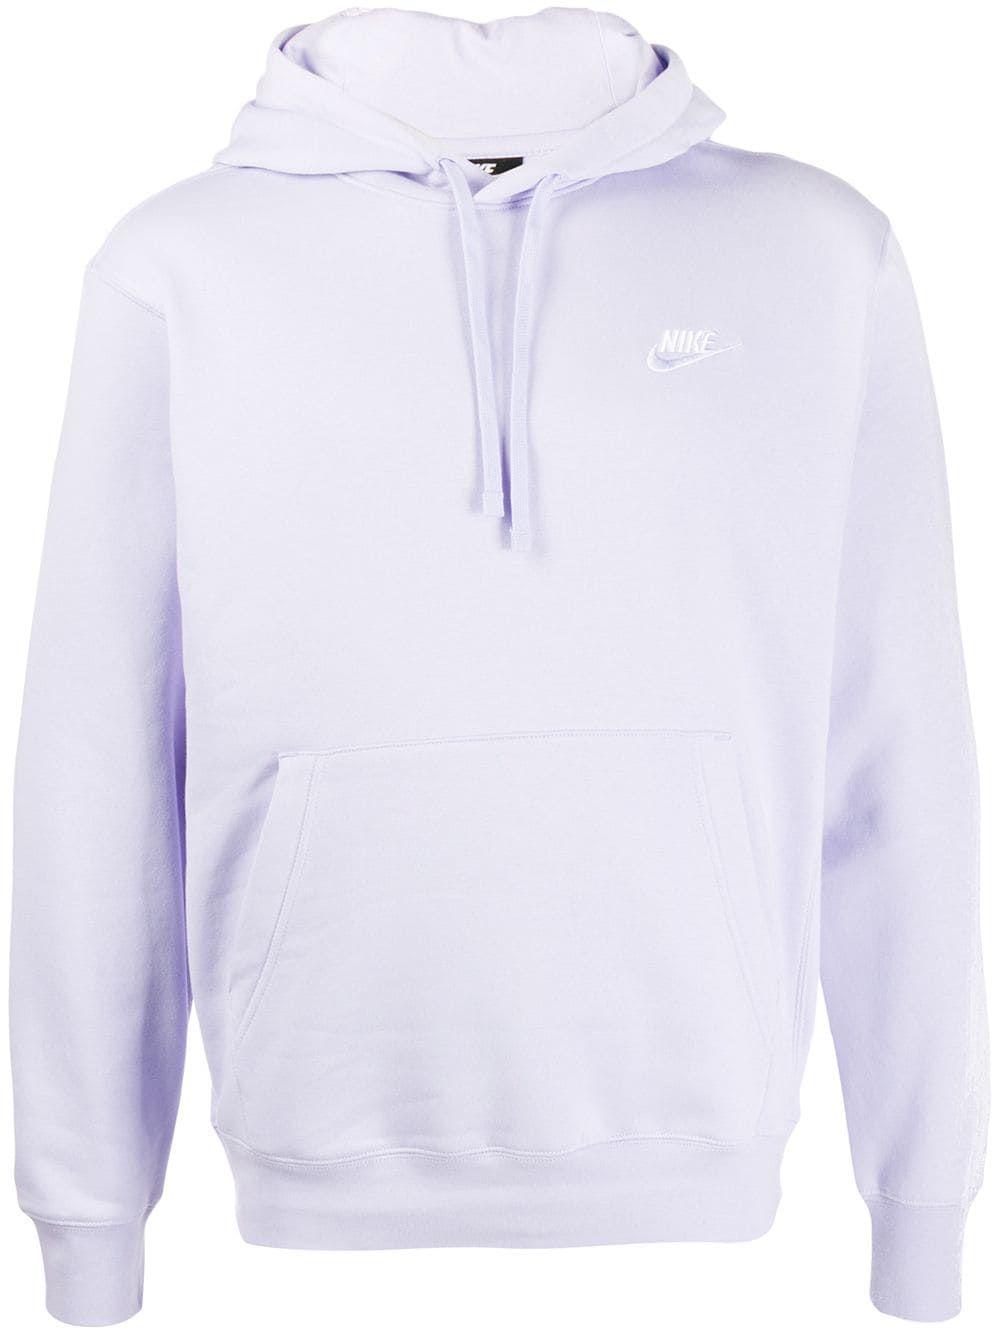 Nike Club Relaxed Fit Hoodie Farfetch Nike Sweatshirts Hoodie Vintage Nike Sweatshirt Nike Outfits [ 1334 x 1000 Pixel ]